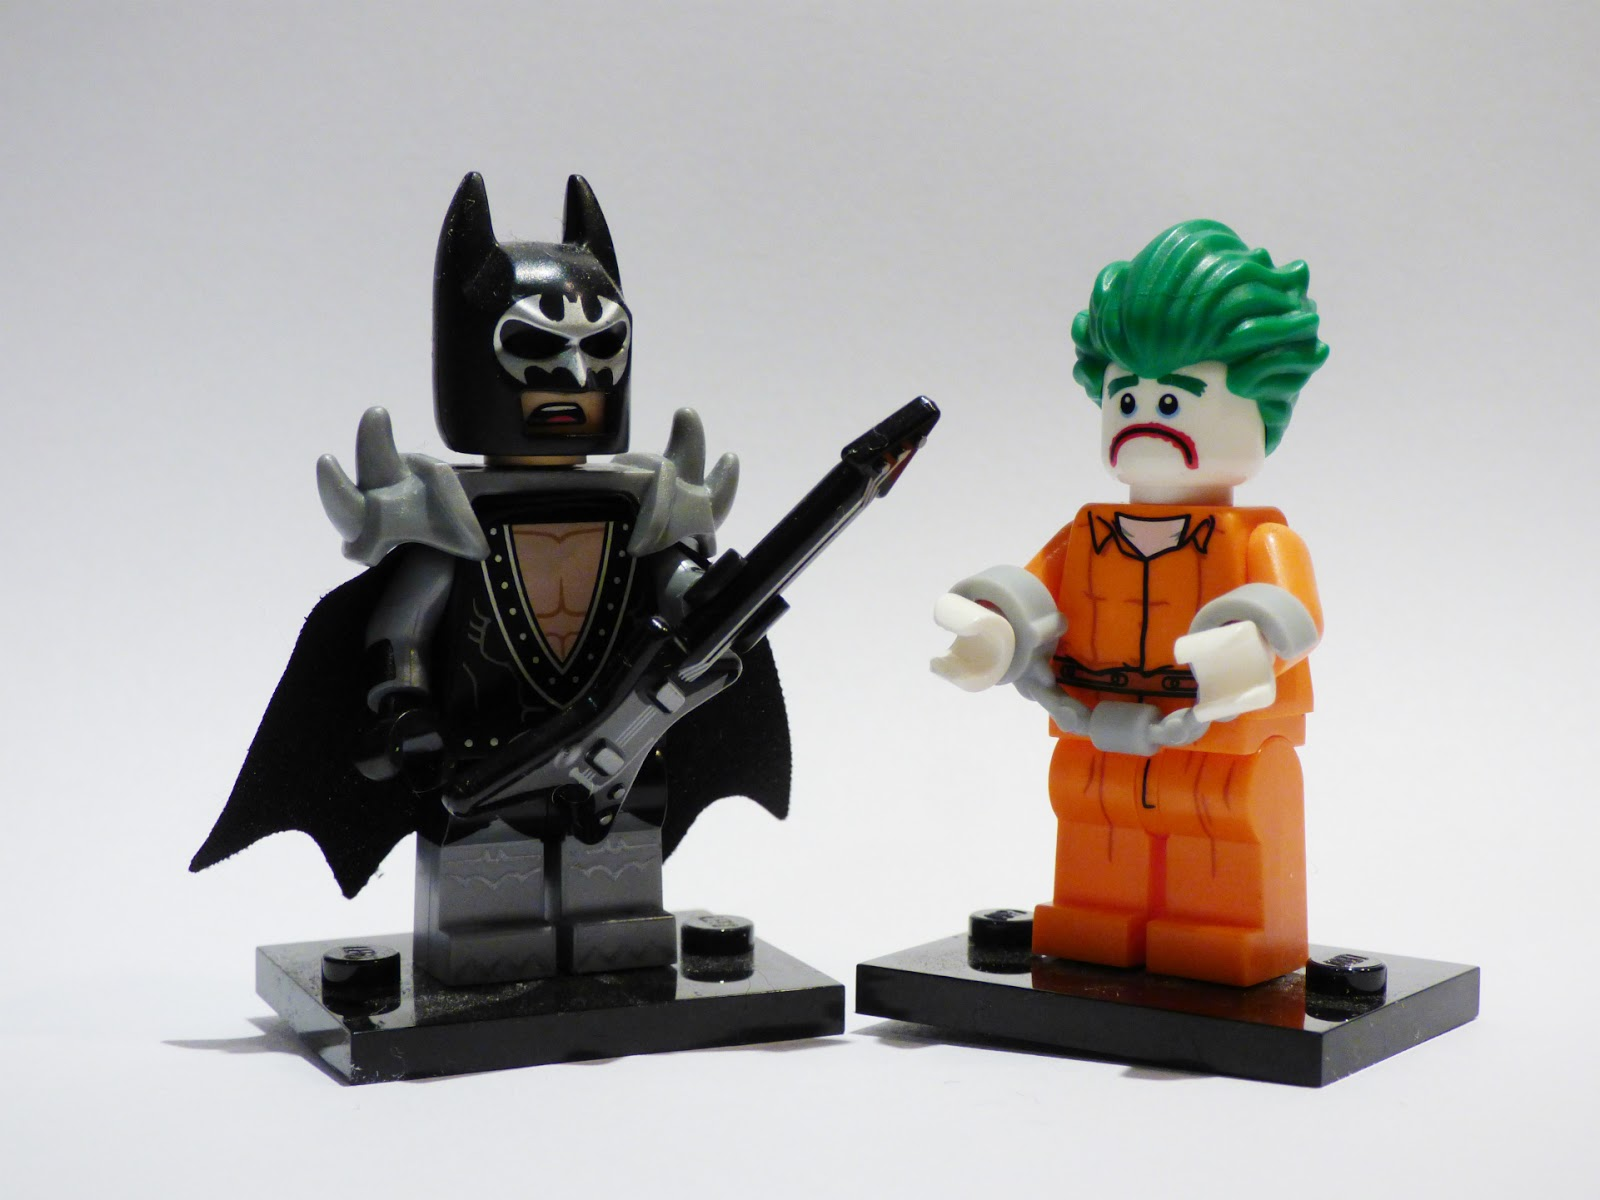 Lego Batman Toys : Chez maximka the lego batman movie review build your